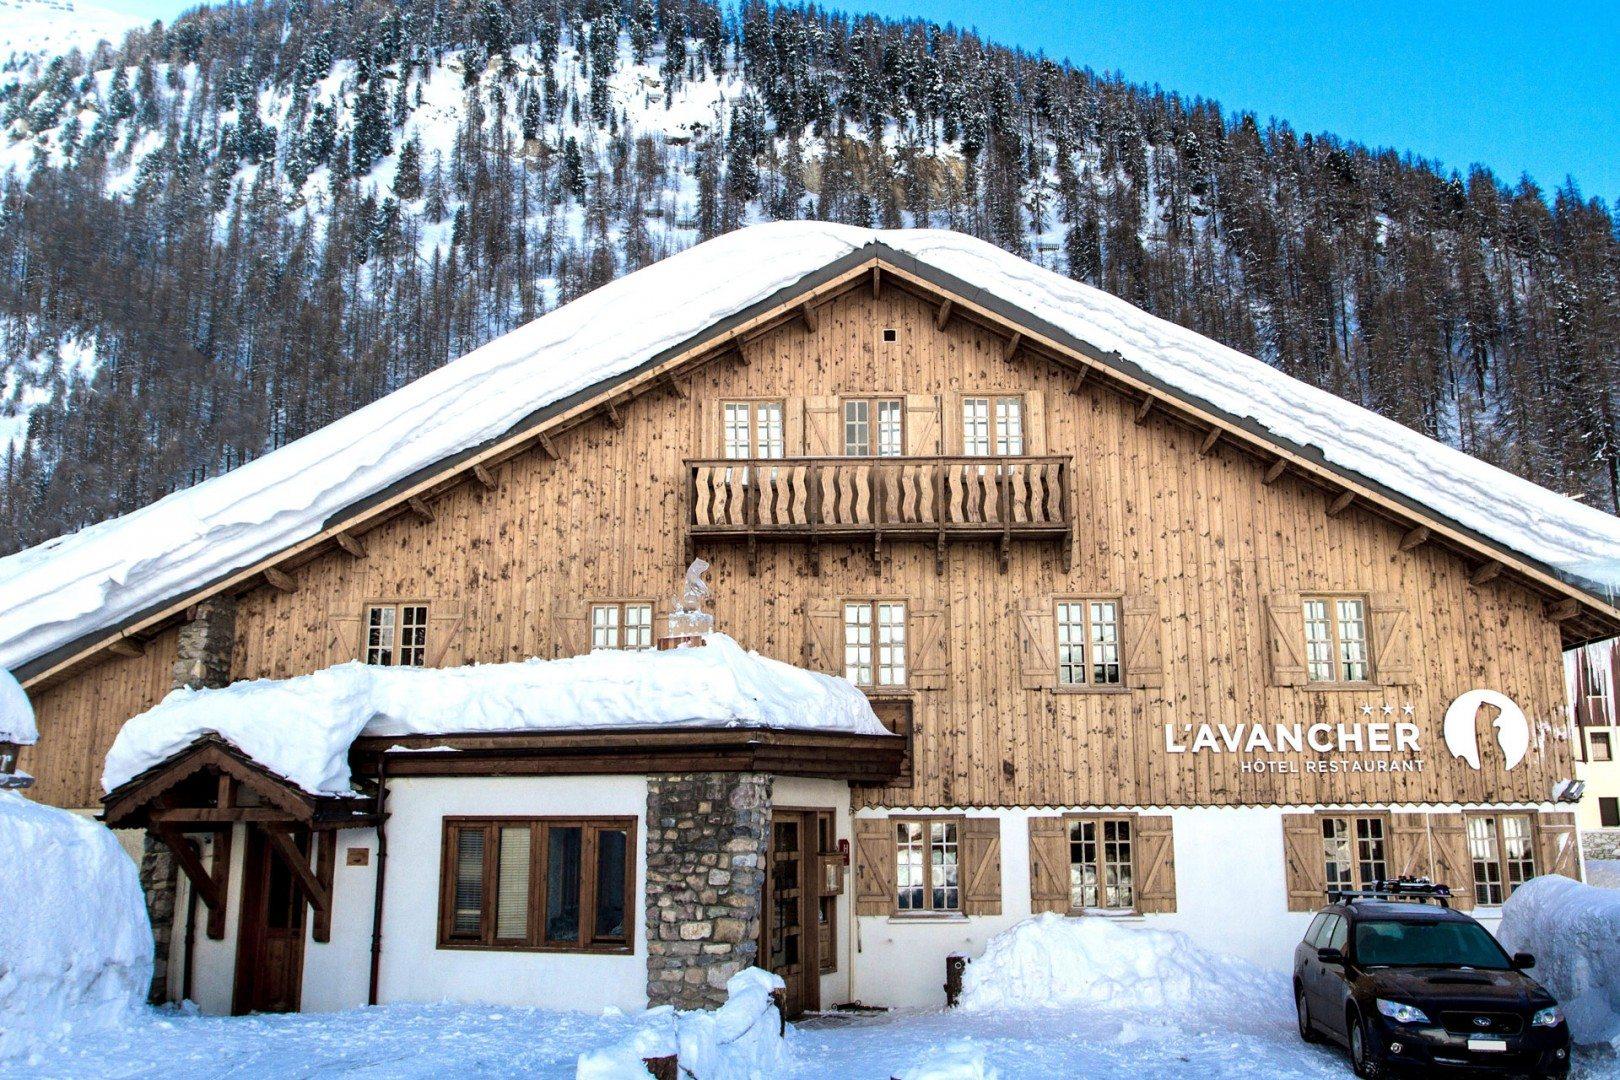 Photo Credit: Hotel L'Avancher